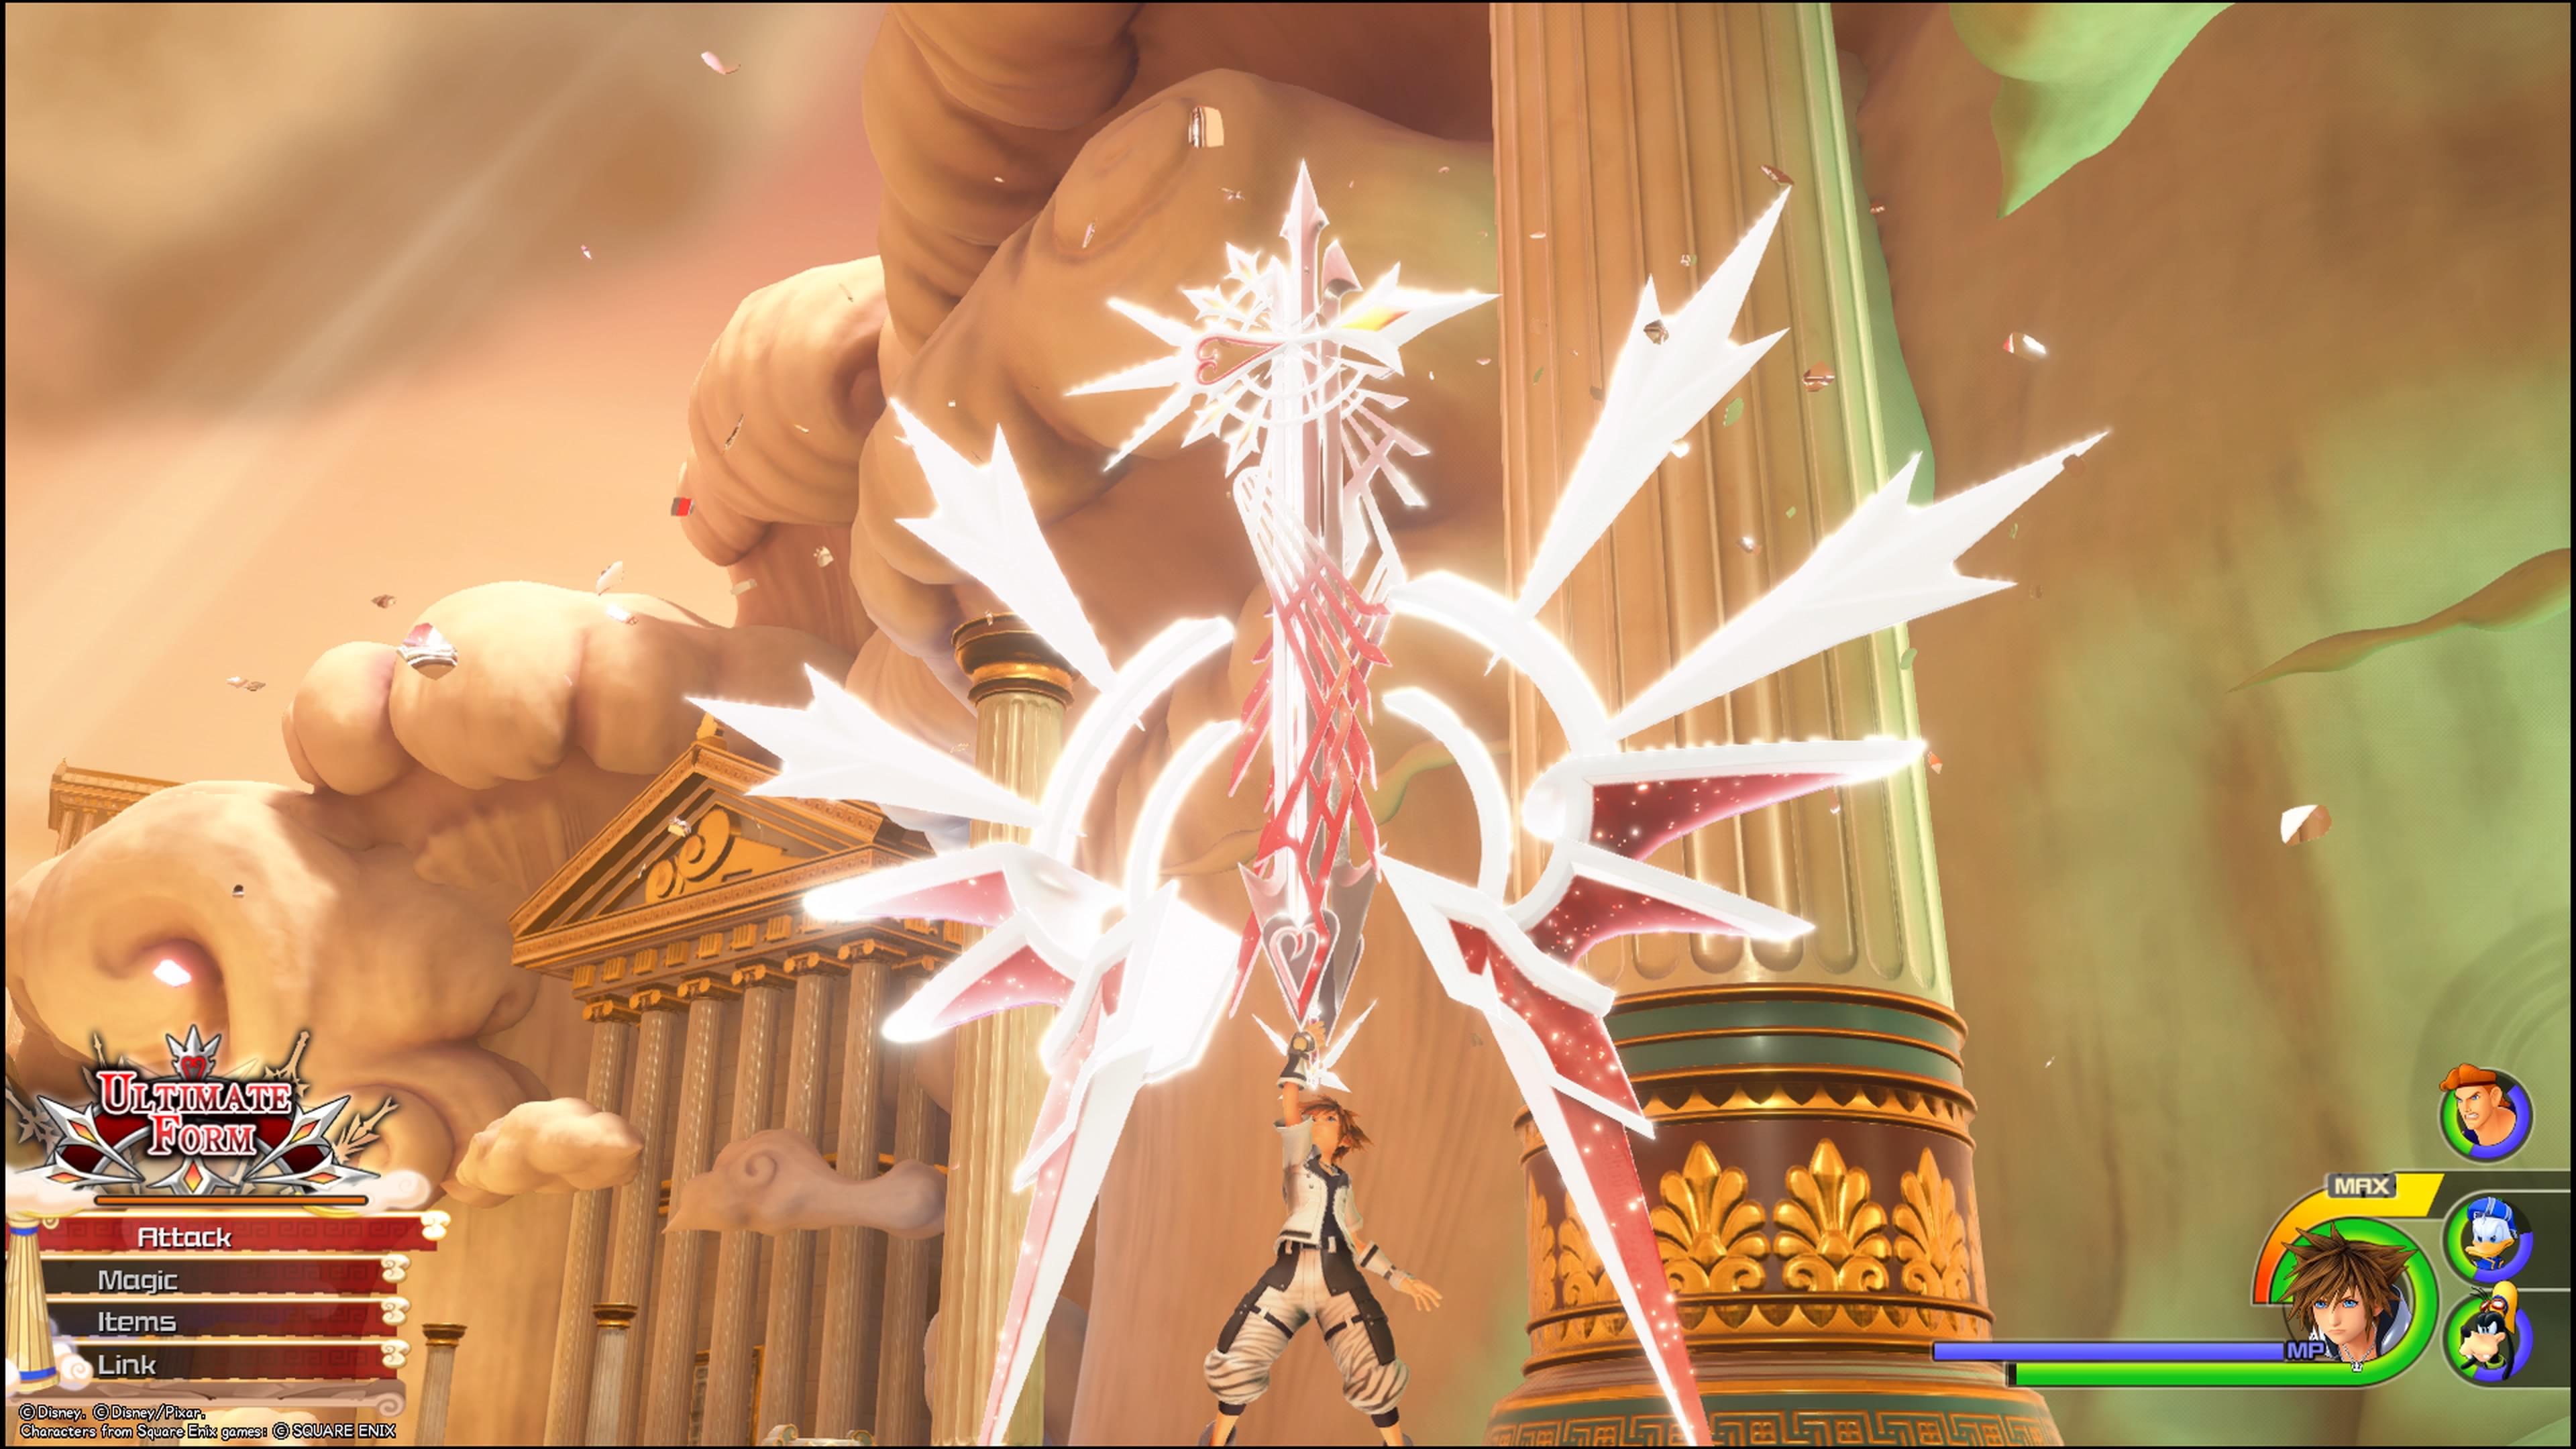 Kingdom Hearts Christmas.Kingdom Hearts 3 Ultima Weapon Guide How To Get The Ultima